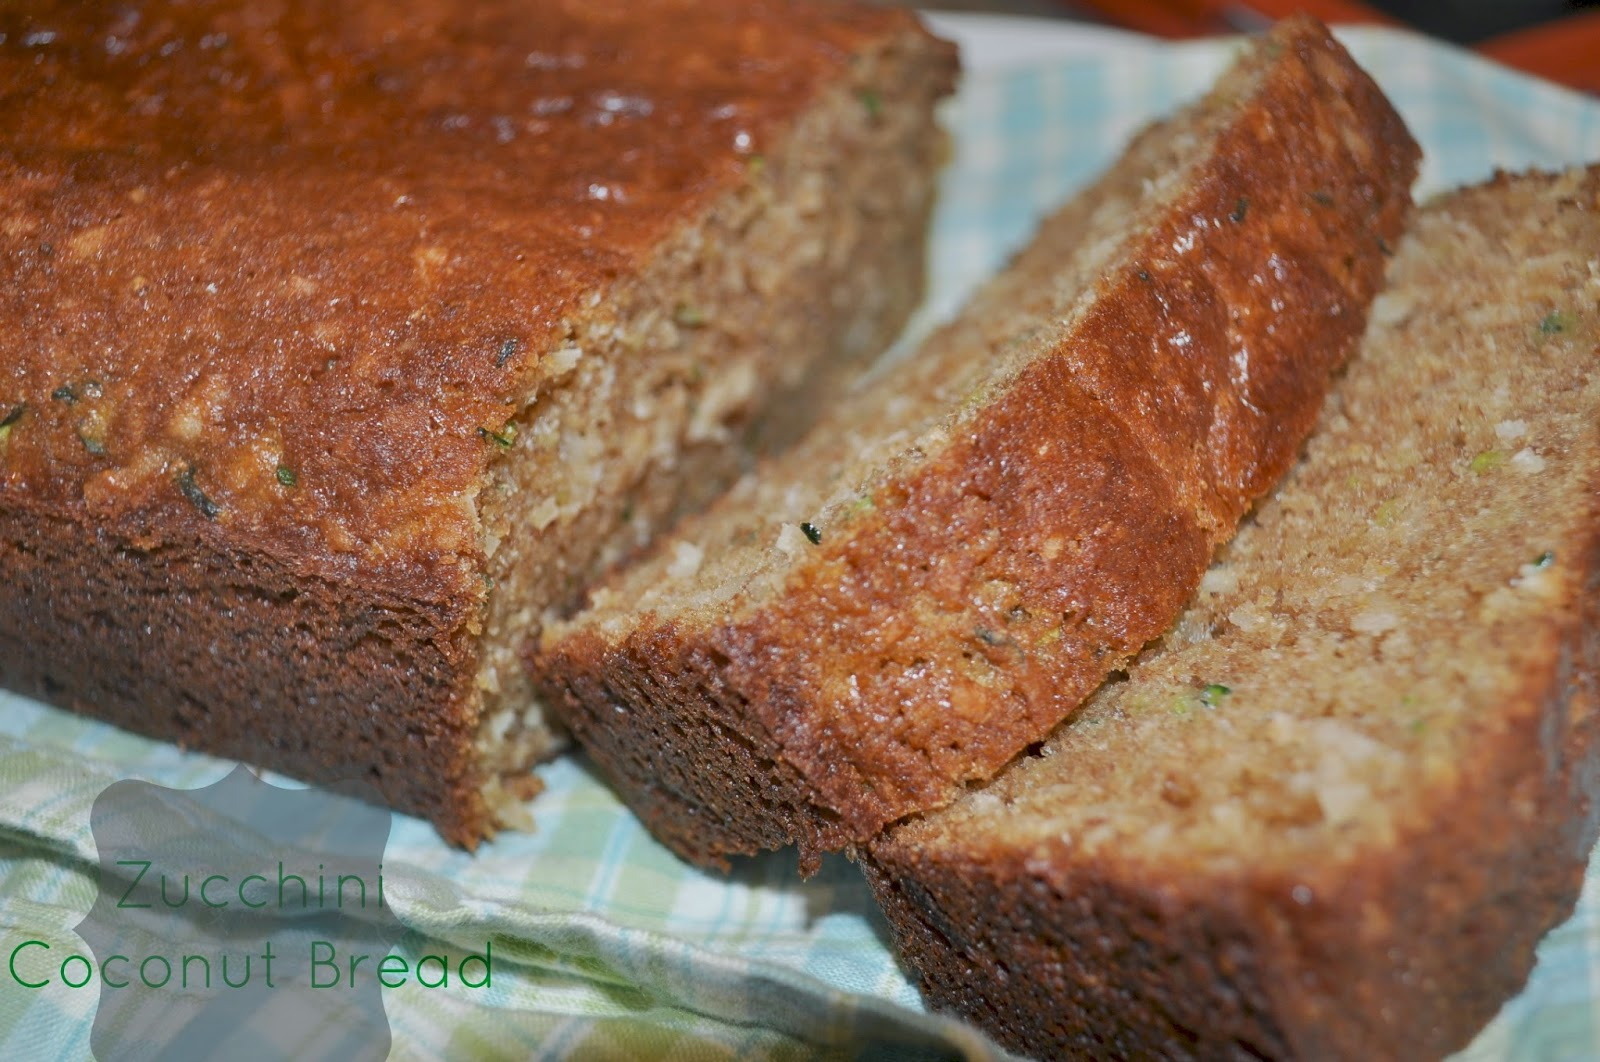 Fit Momma Foodie: Zucchini Coconut Bread